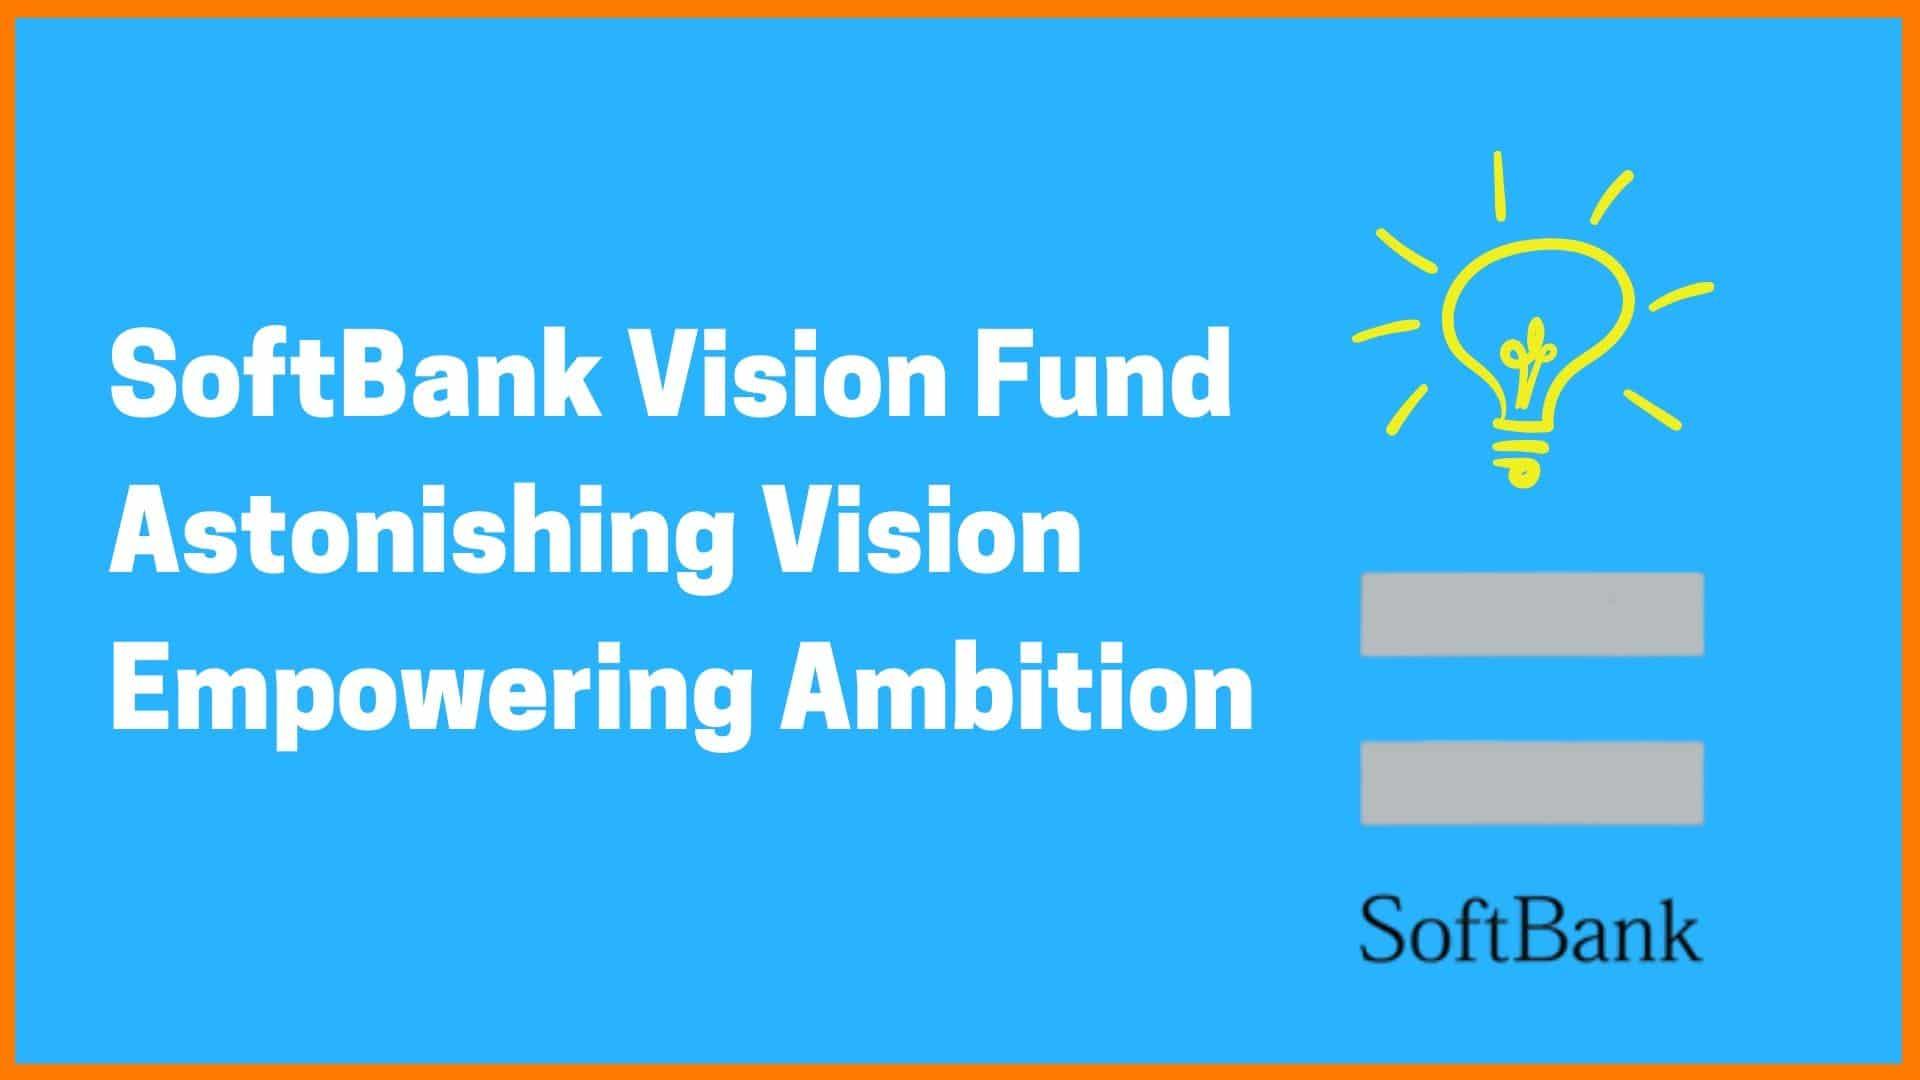 SoftBank: Astonishing Vision Empowering Ambition